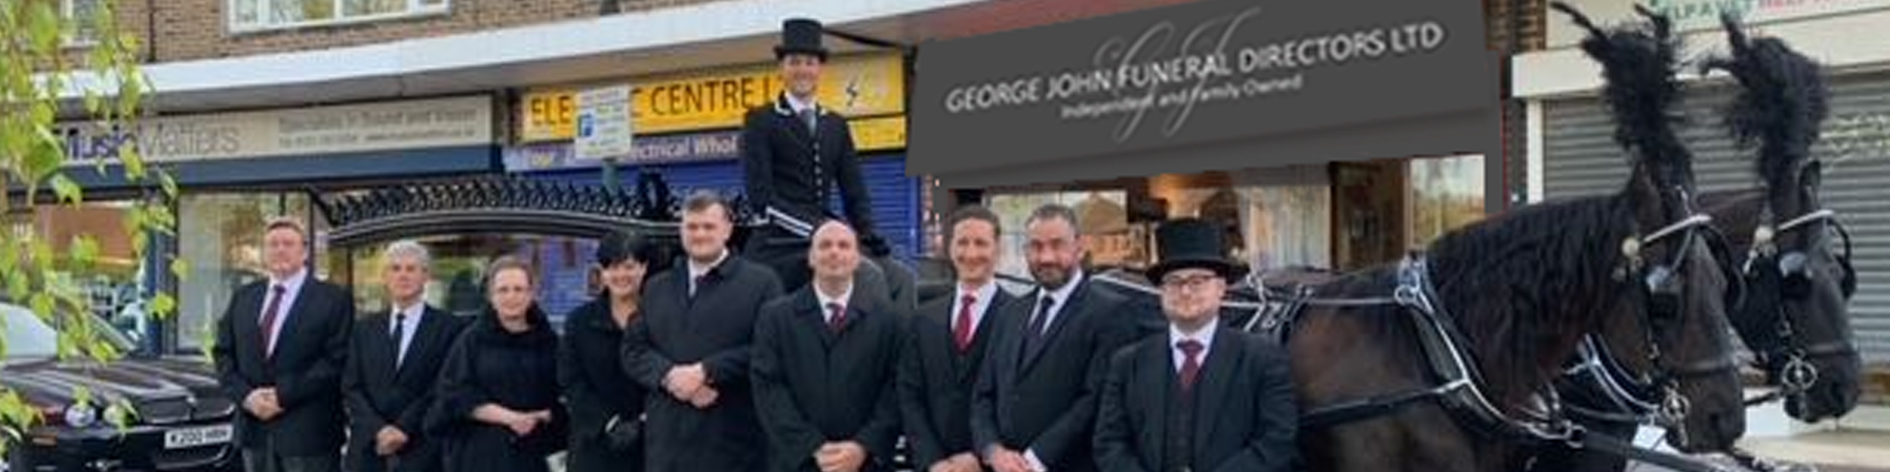 Staff at George john Funeral Directors